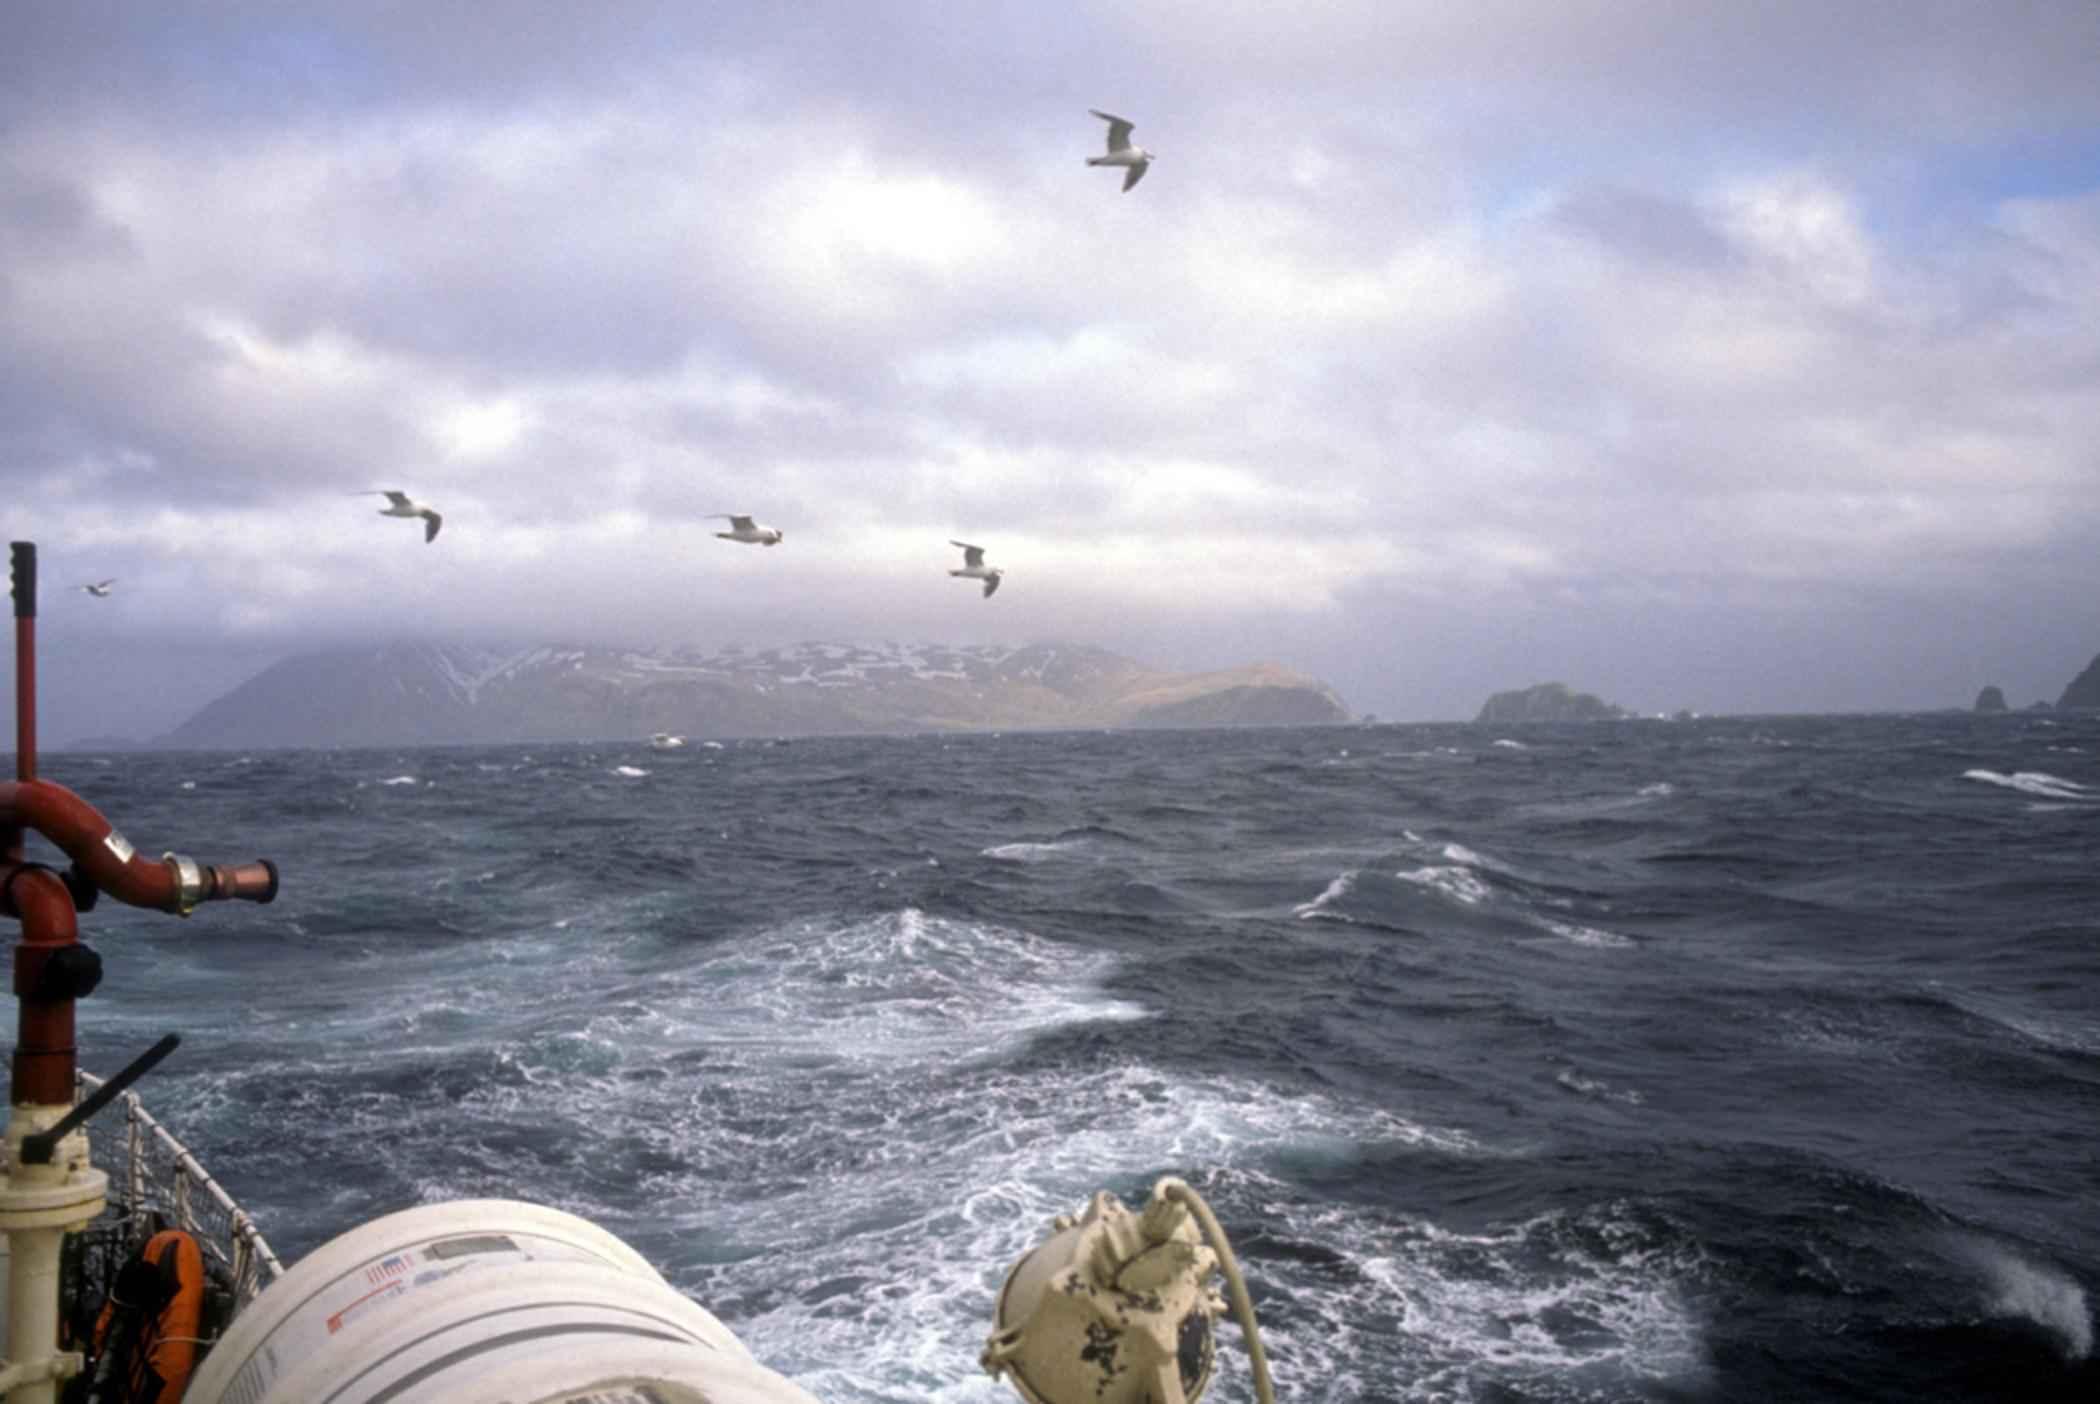 File:Boat In Storm At Sea.jpg